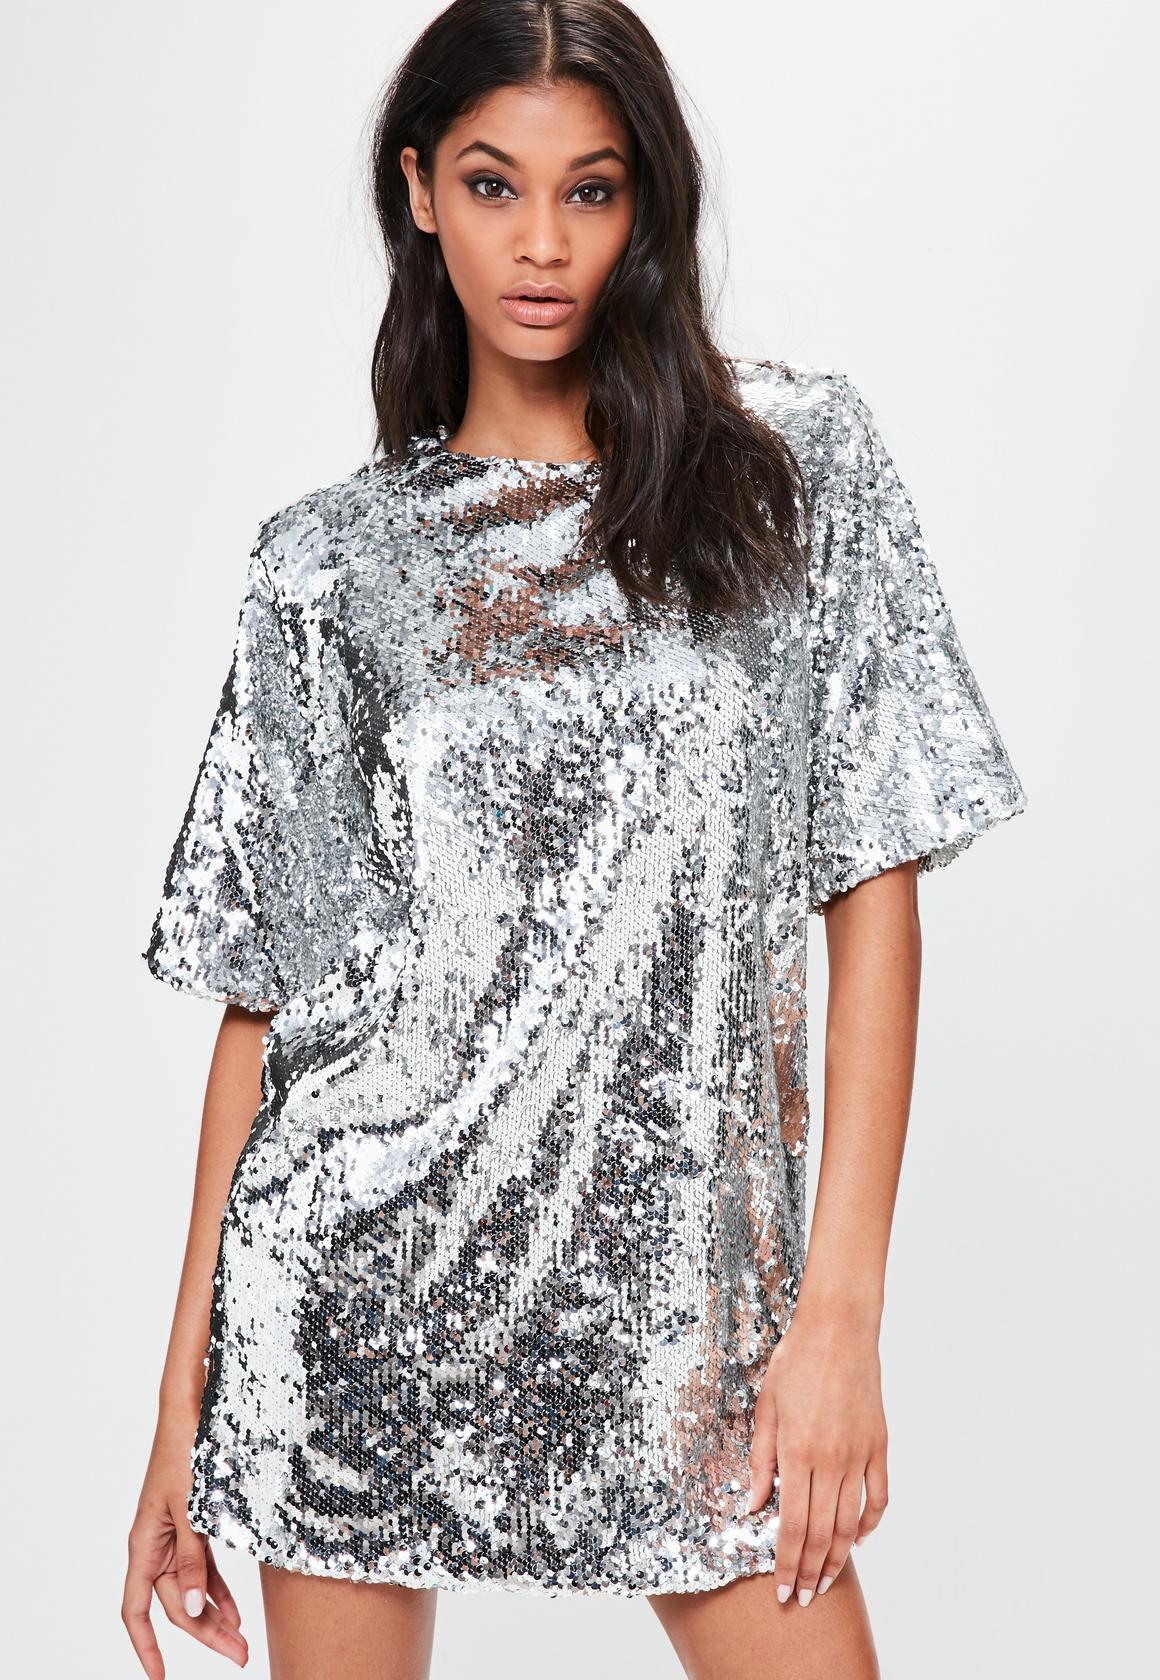 silver sequin dress londunn + missguided silver sequin mini dress QJRSOKB